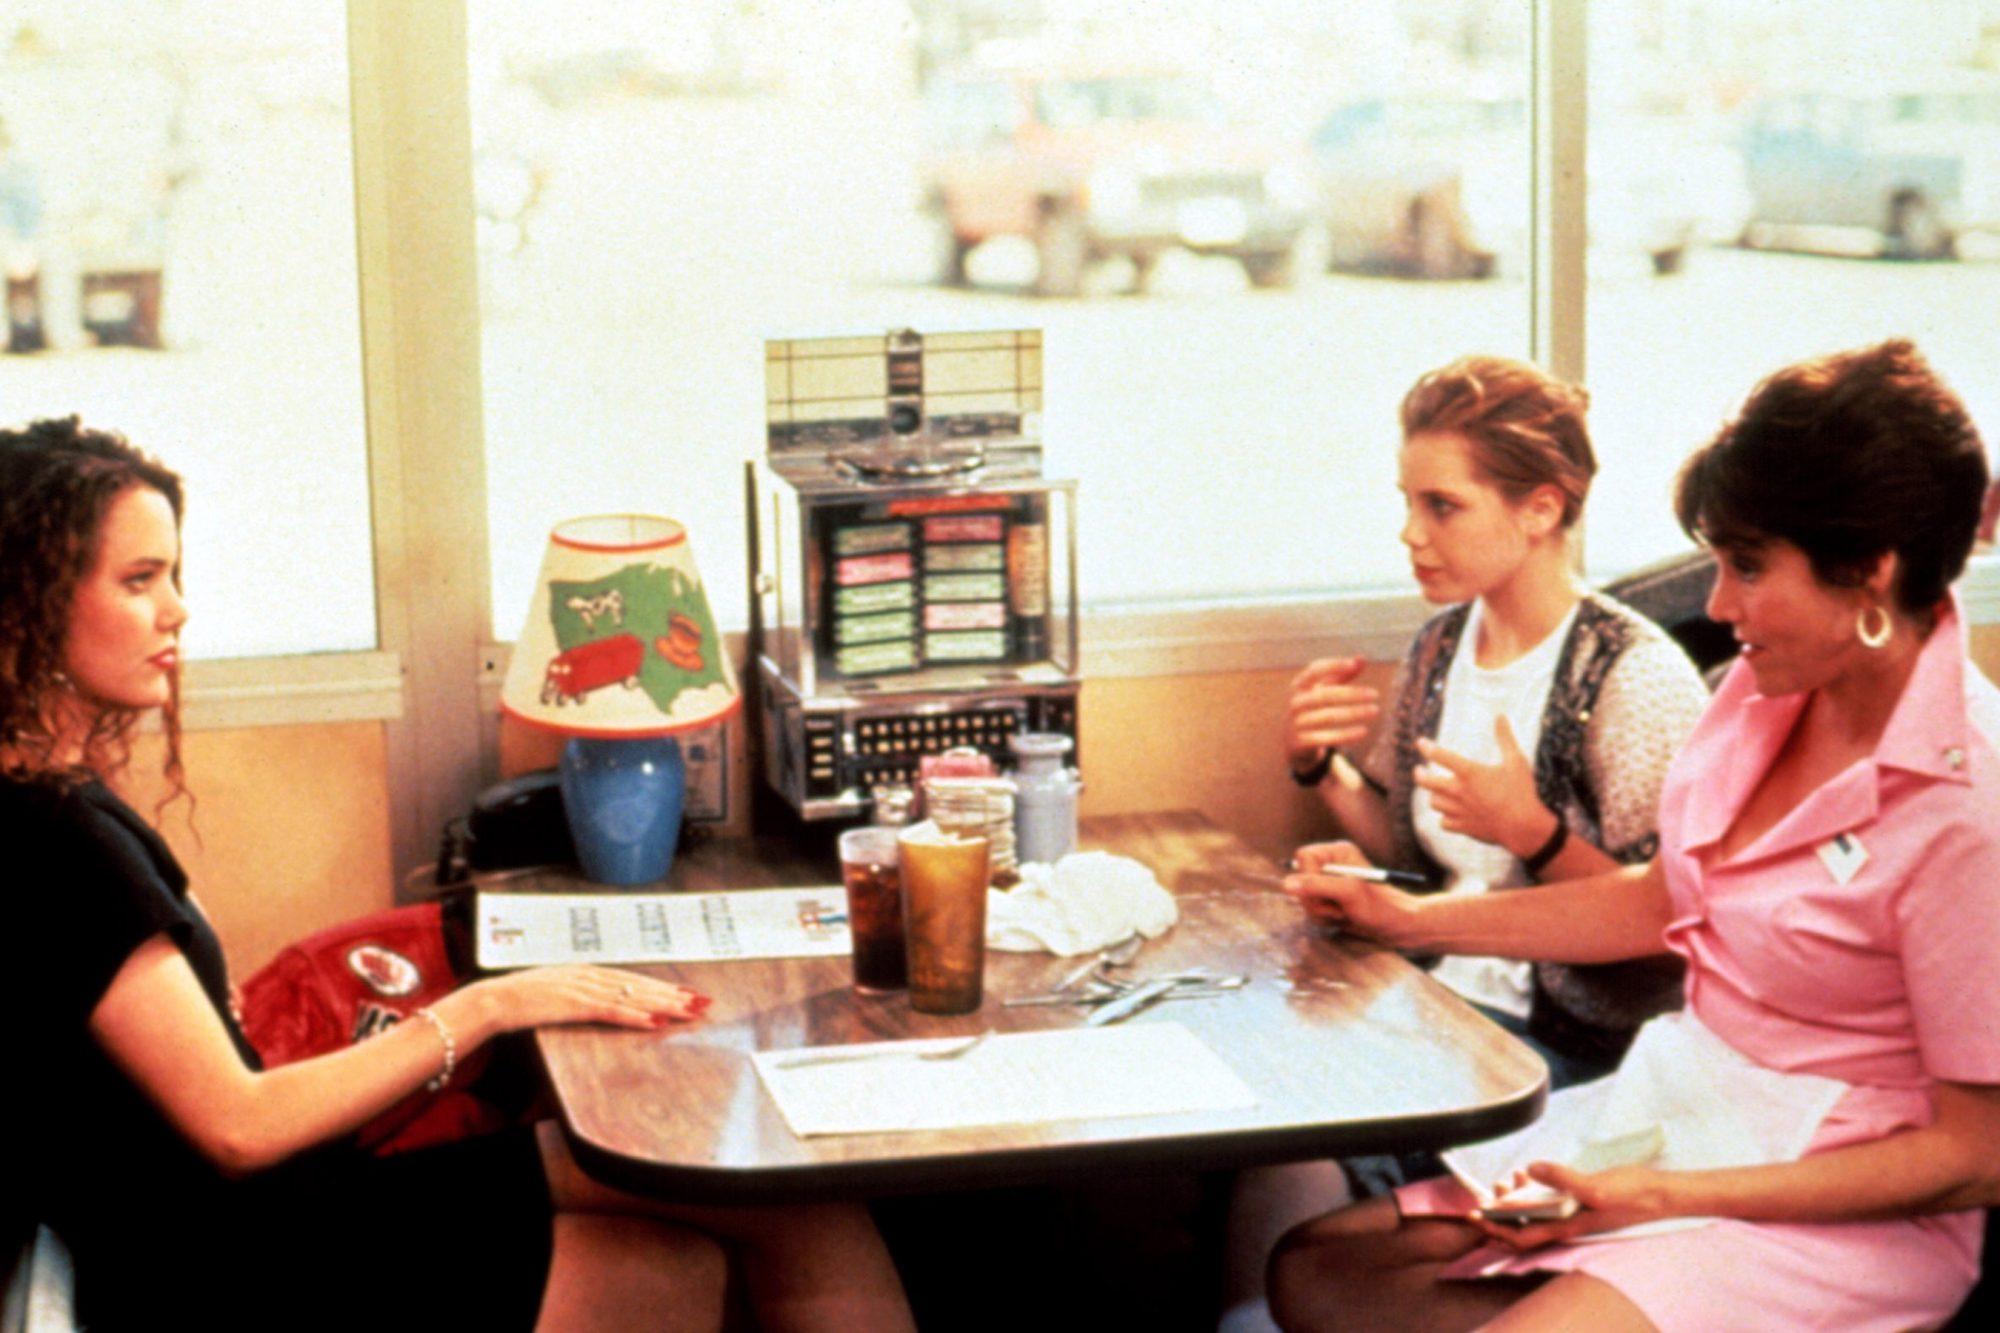 GAS FOOD LODGING, Ione Skye, Fairuza Balk, Brooke Adams, 1992